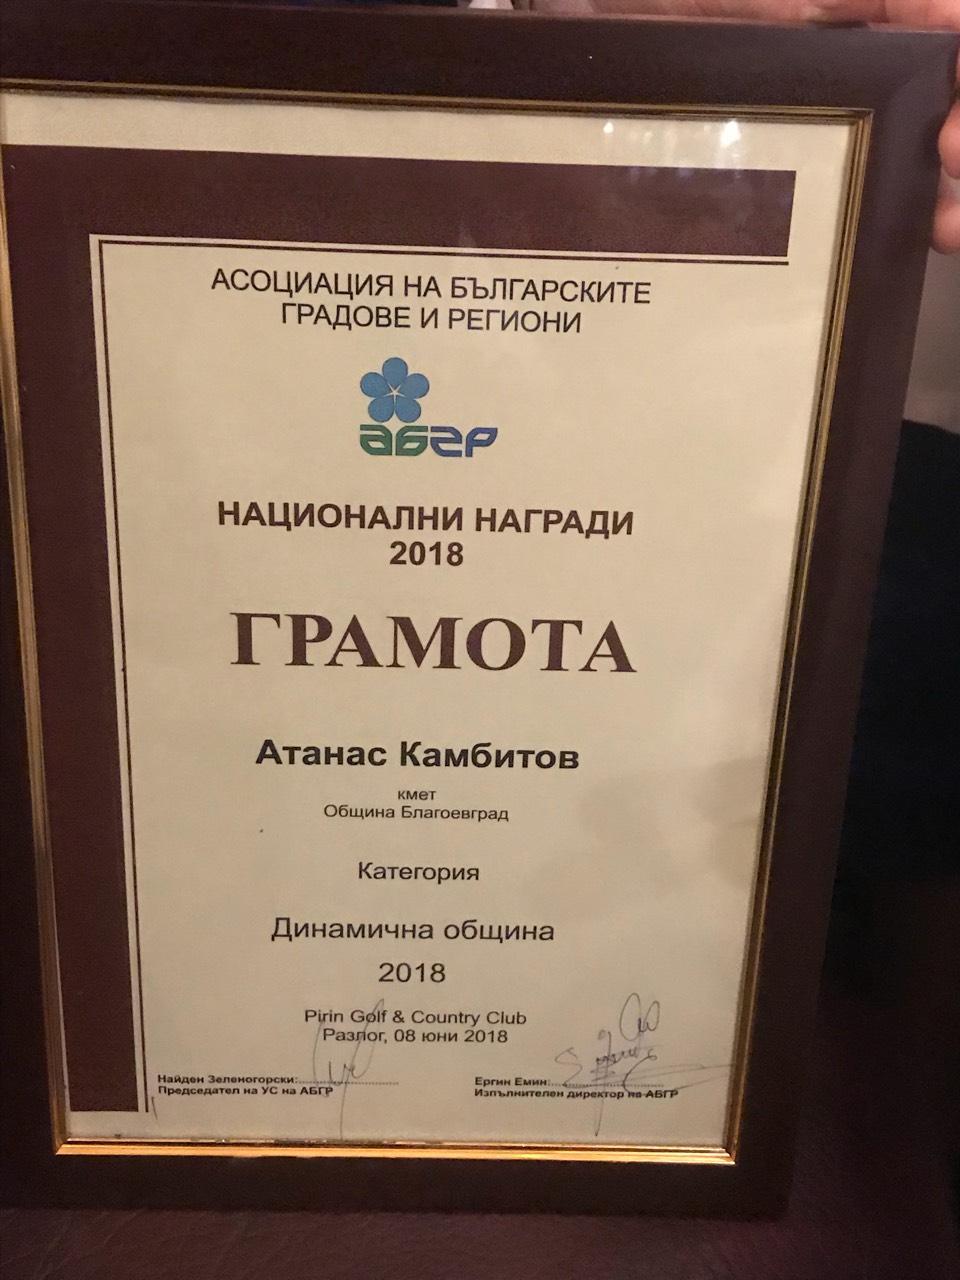 Благоевград спечели  приз за  Динамична община